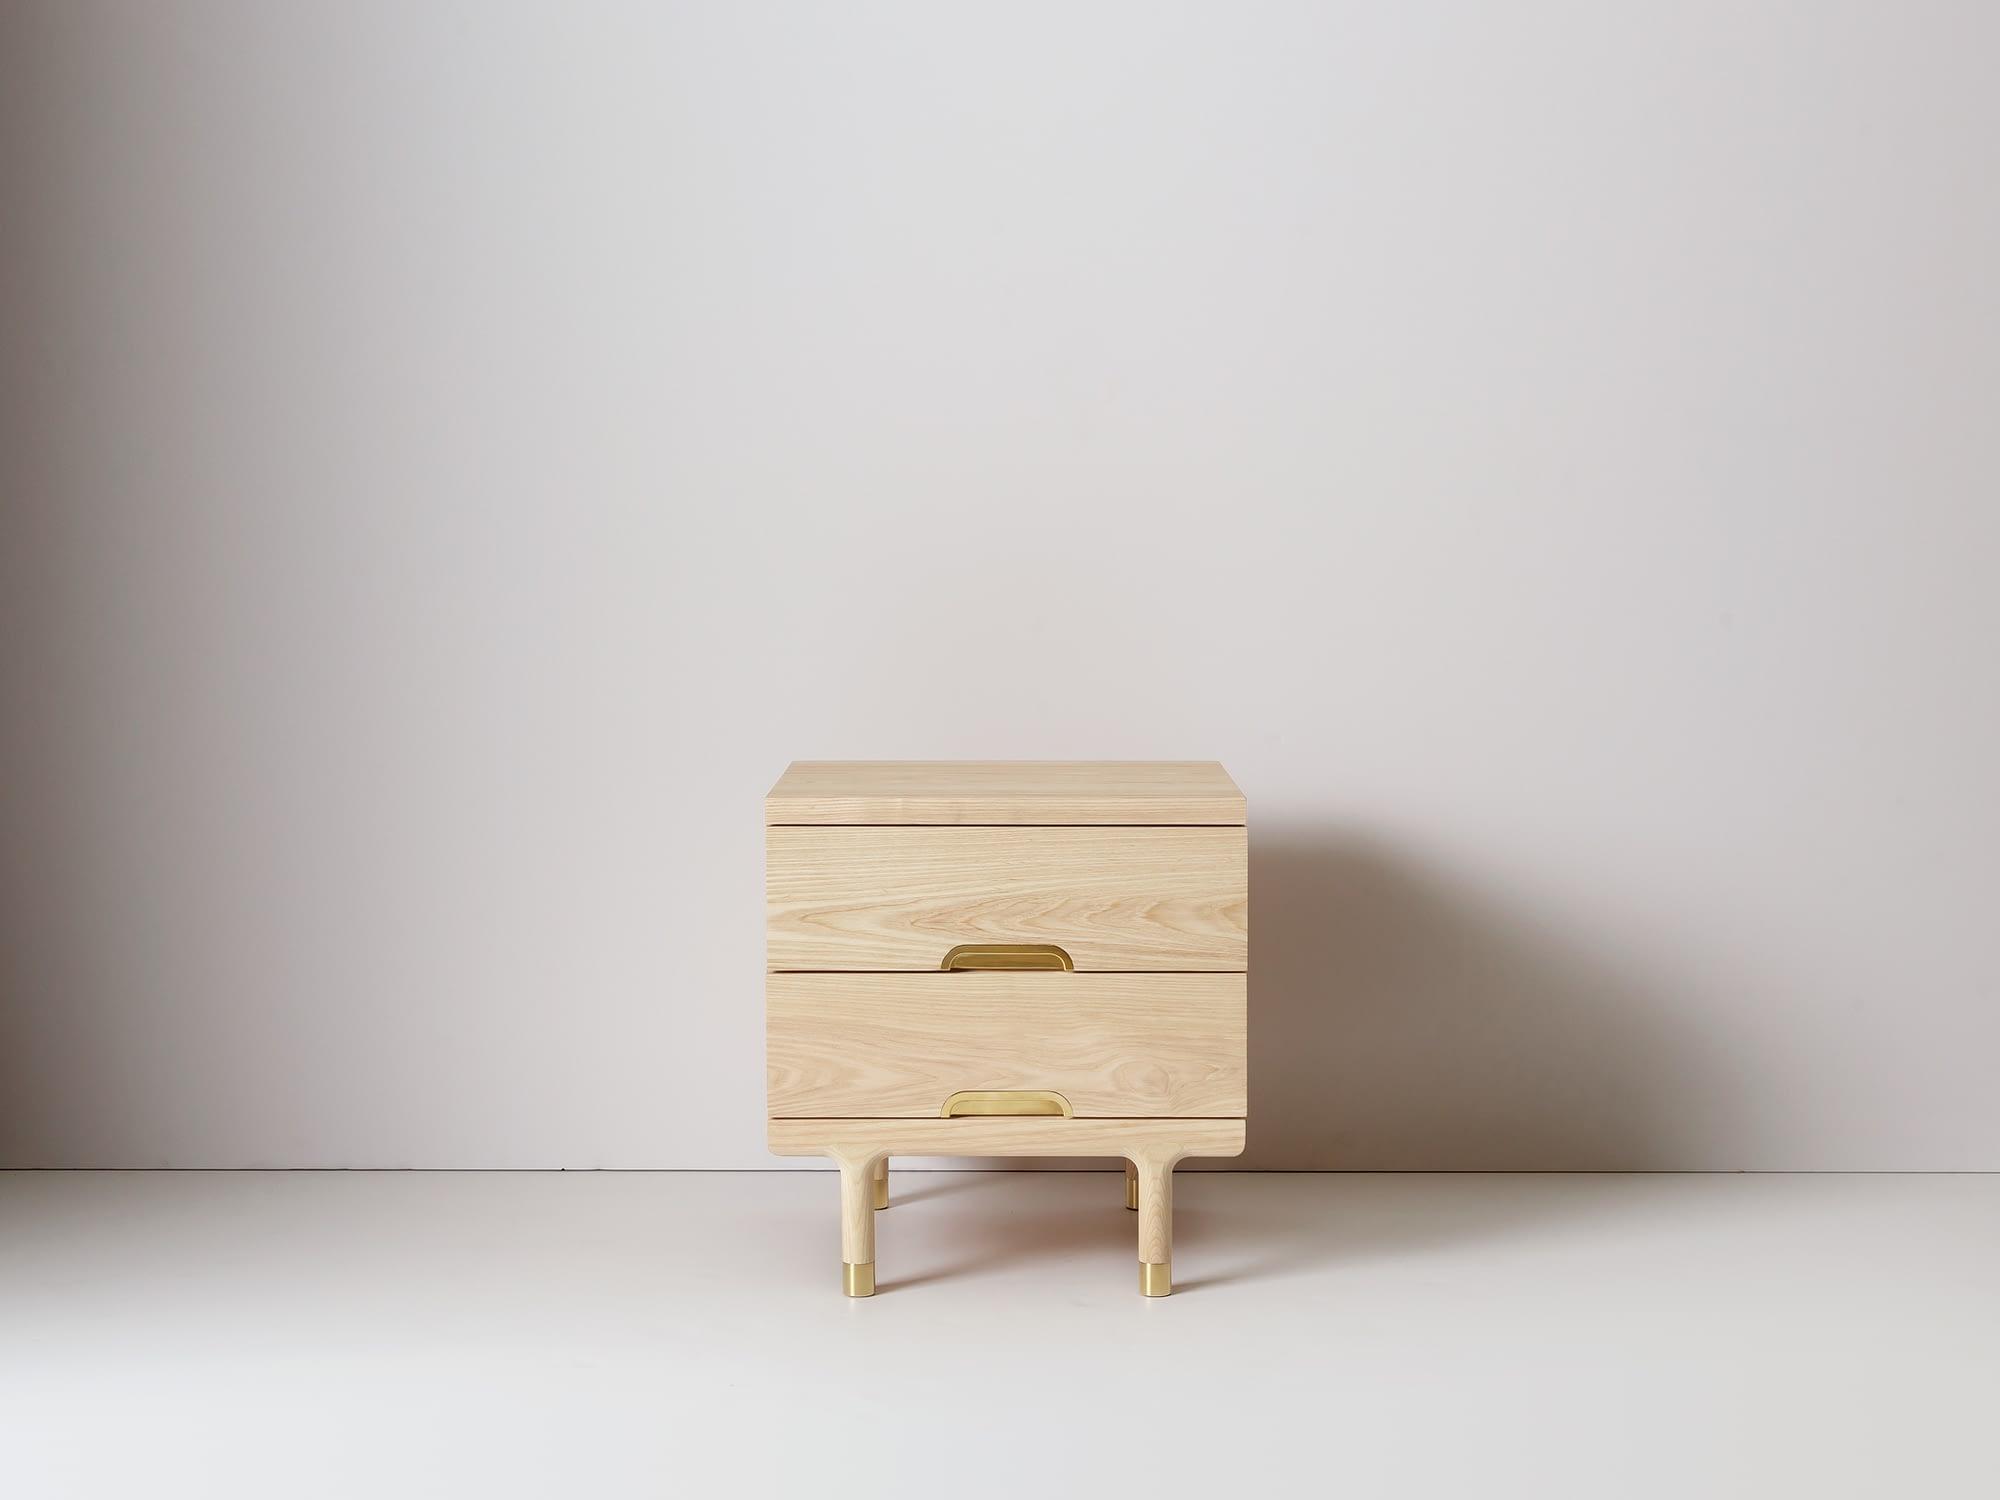 Modern Solid Wood Simple Side Table Nightstand